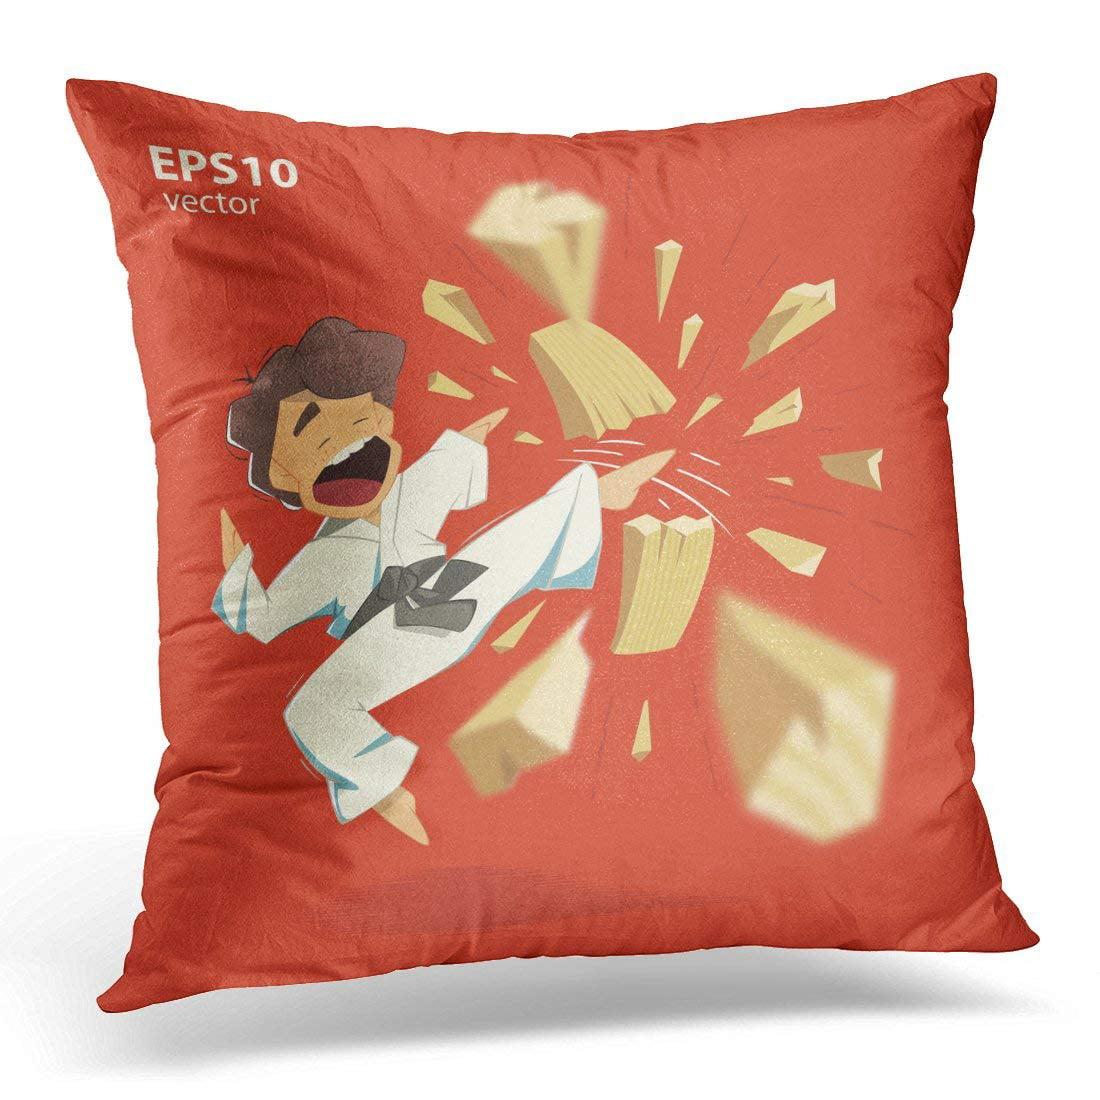 CMFUN Black Wood Cartoon Character Karate Kid Breaking Wooden Board Red Break Pillow Case Pillow Cover 20x20 inch